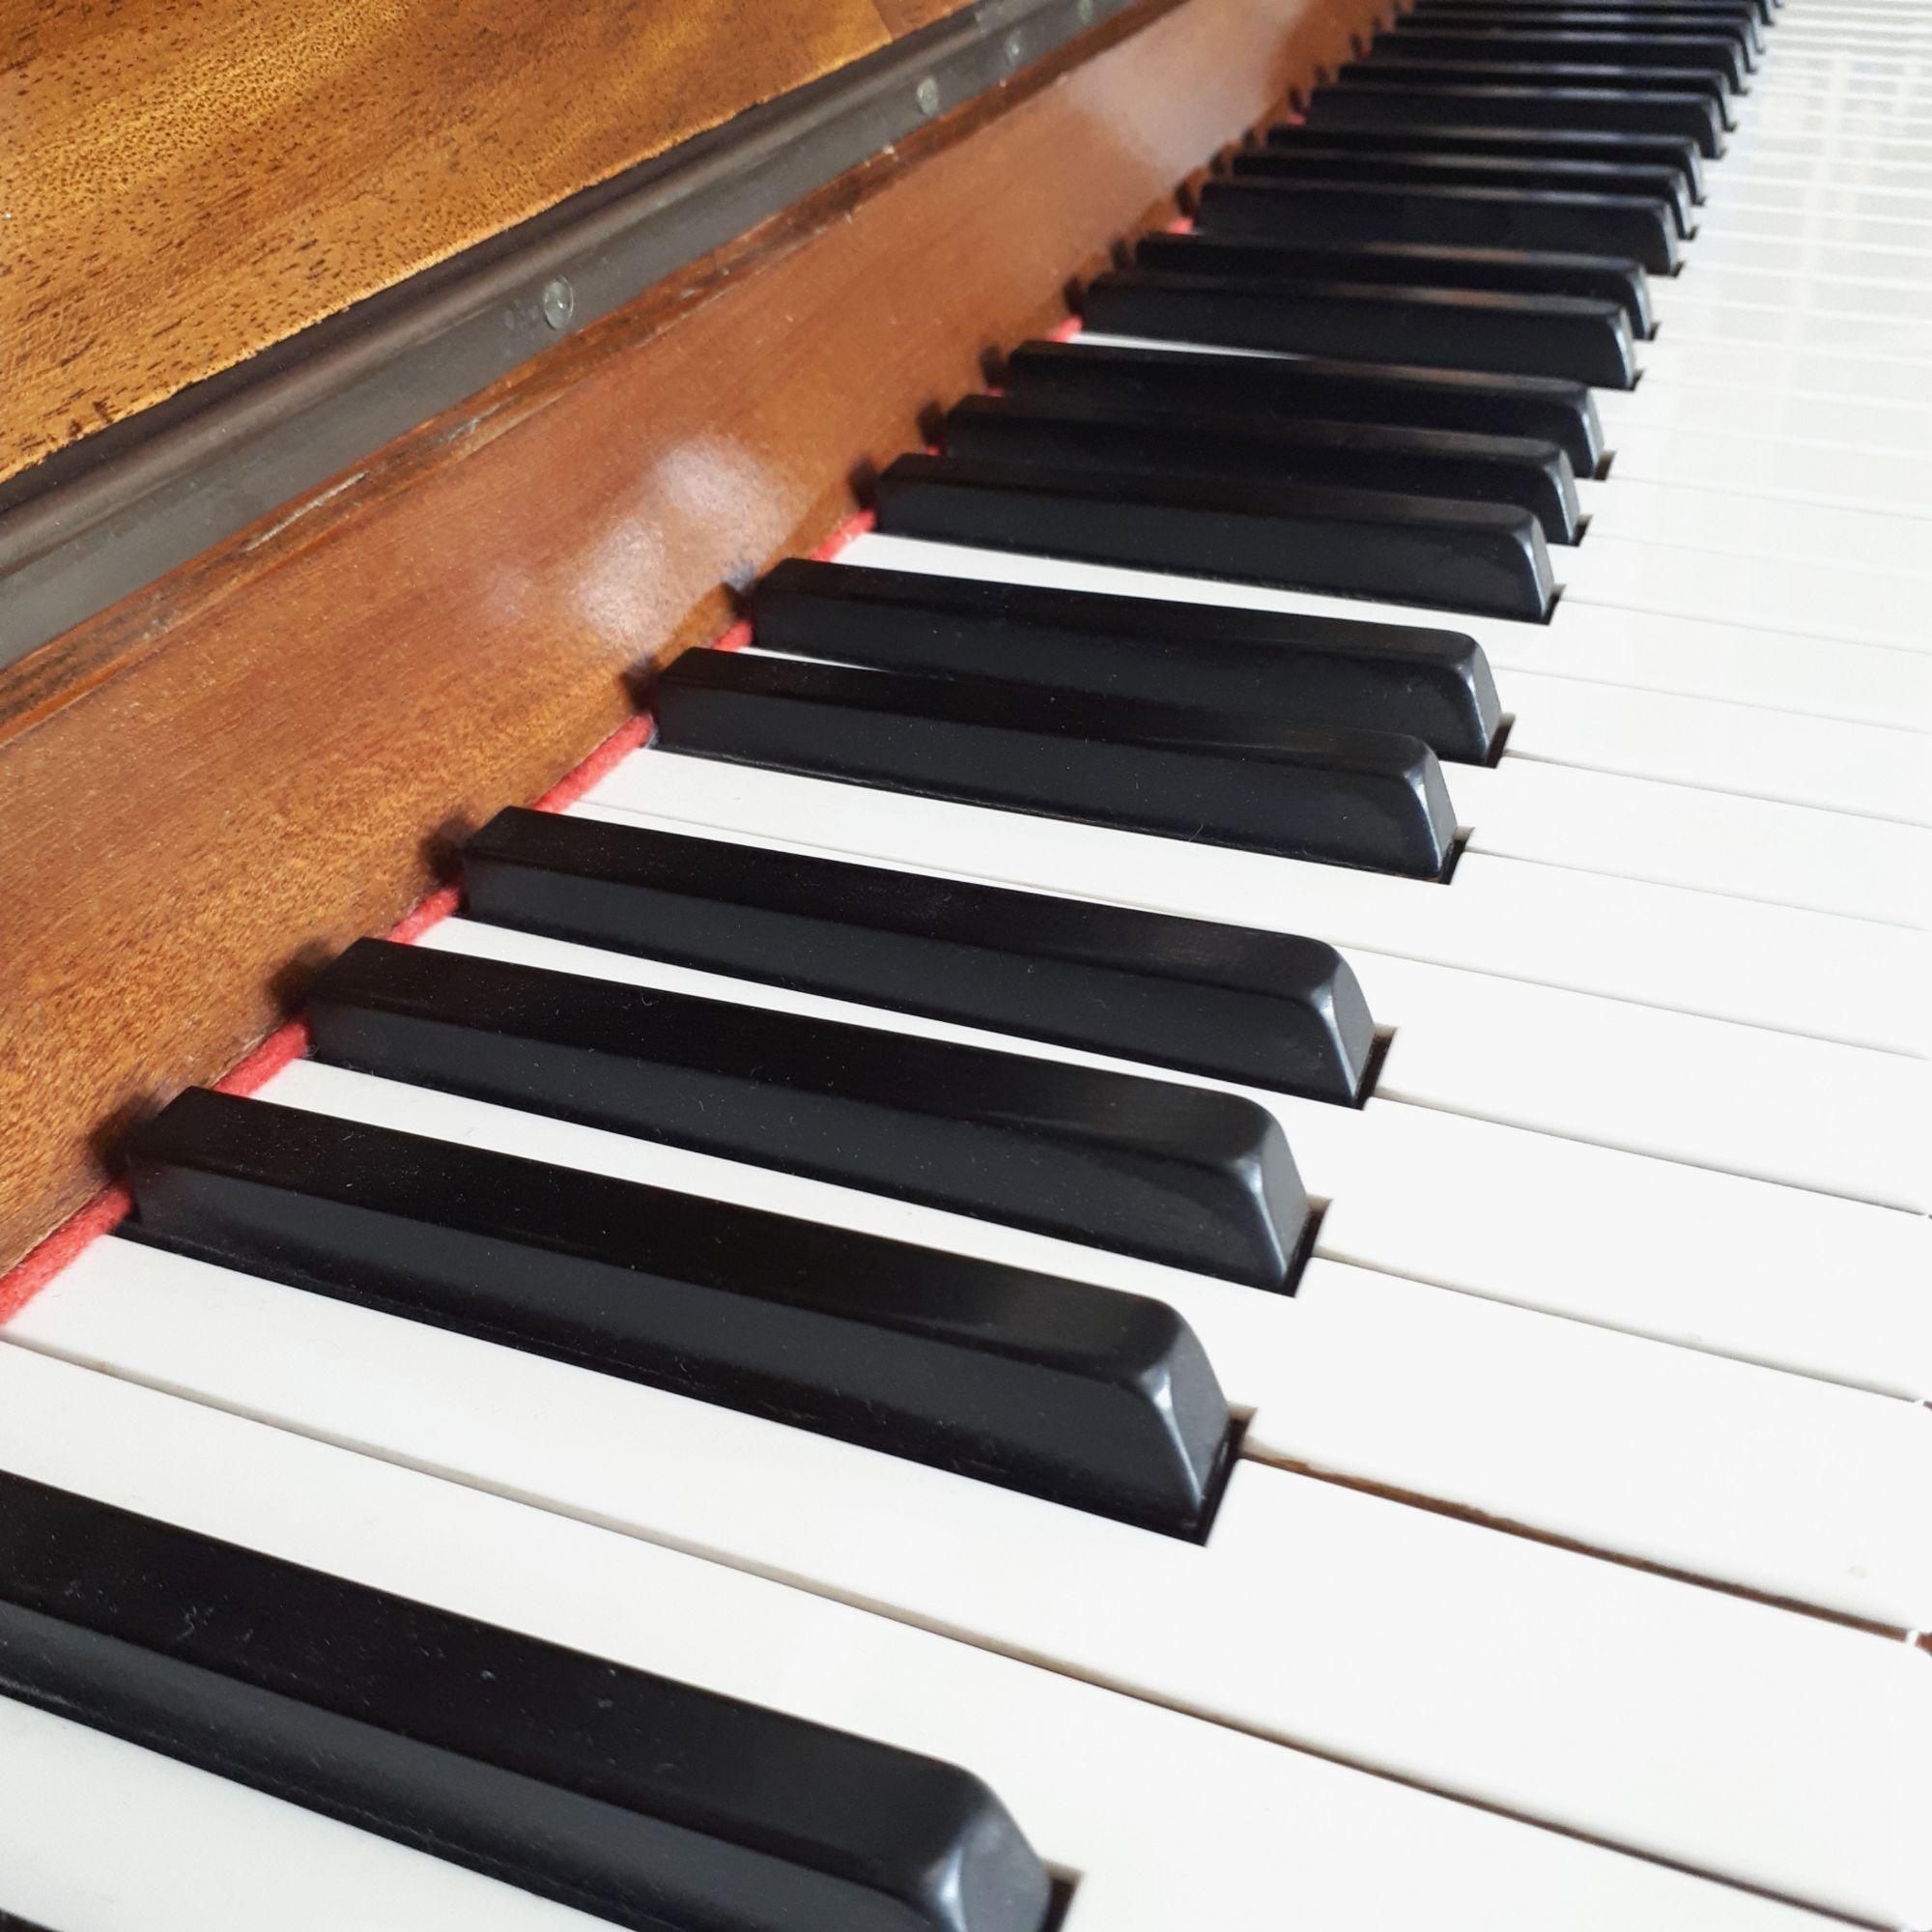 Lisztian: Piano Keys